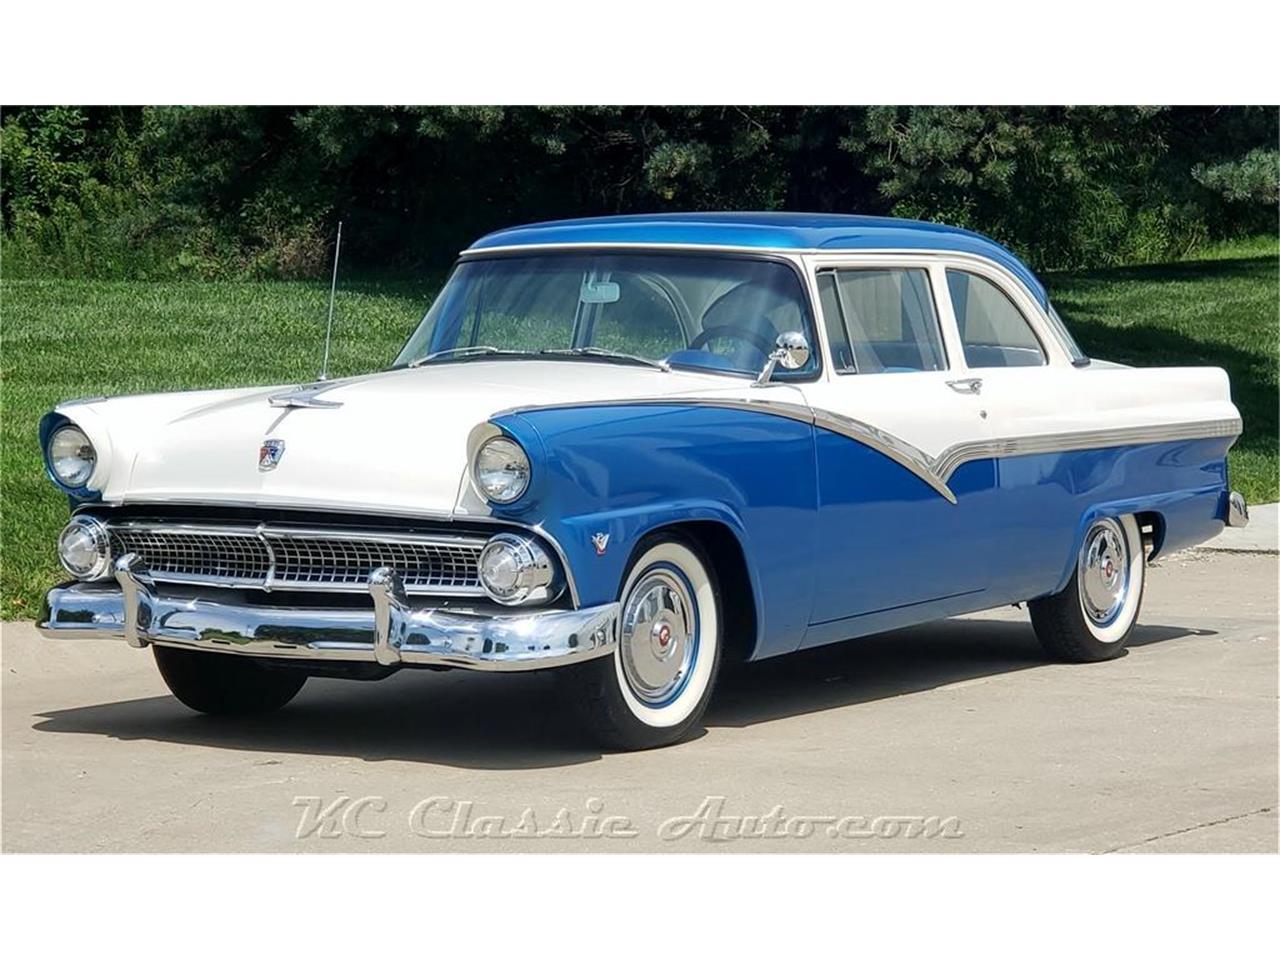 for sale 1955 ford customline in lenexa, kansas cars - shawnee mission, ks at geebo